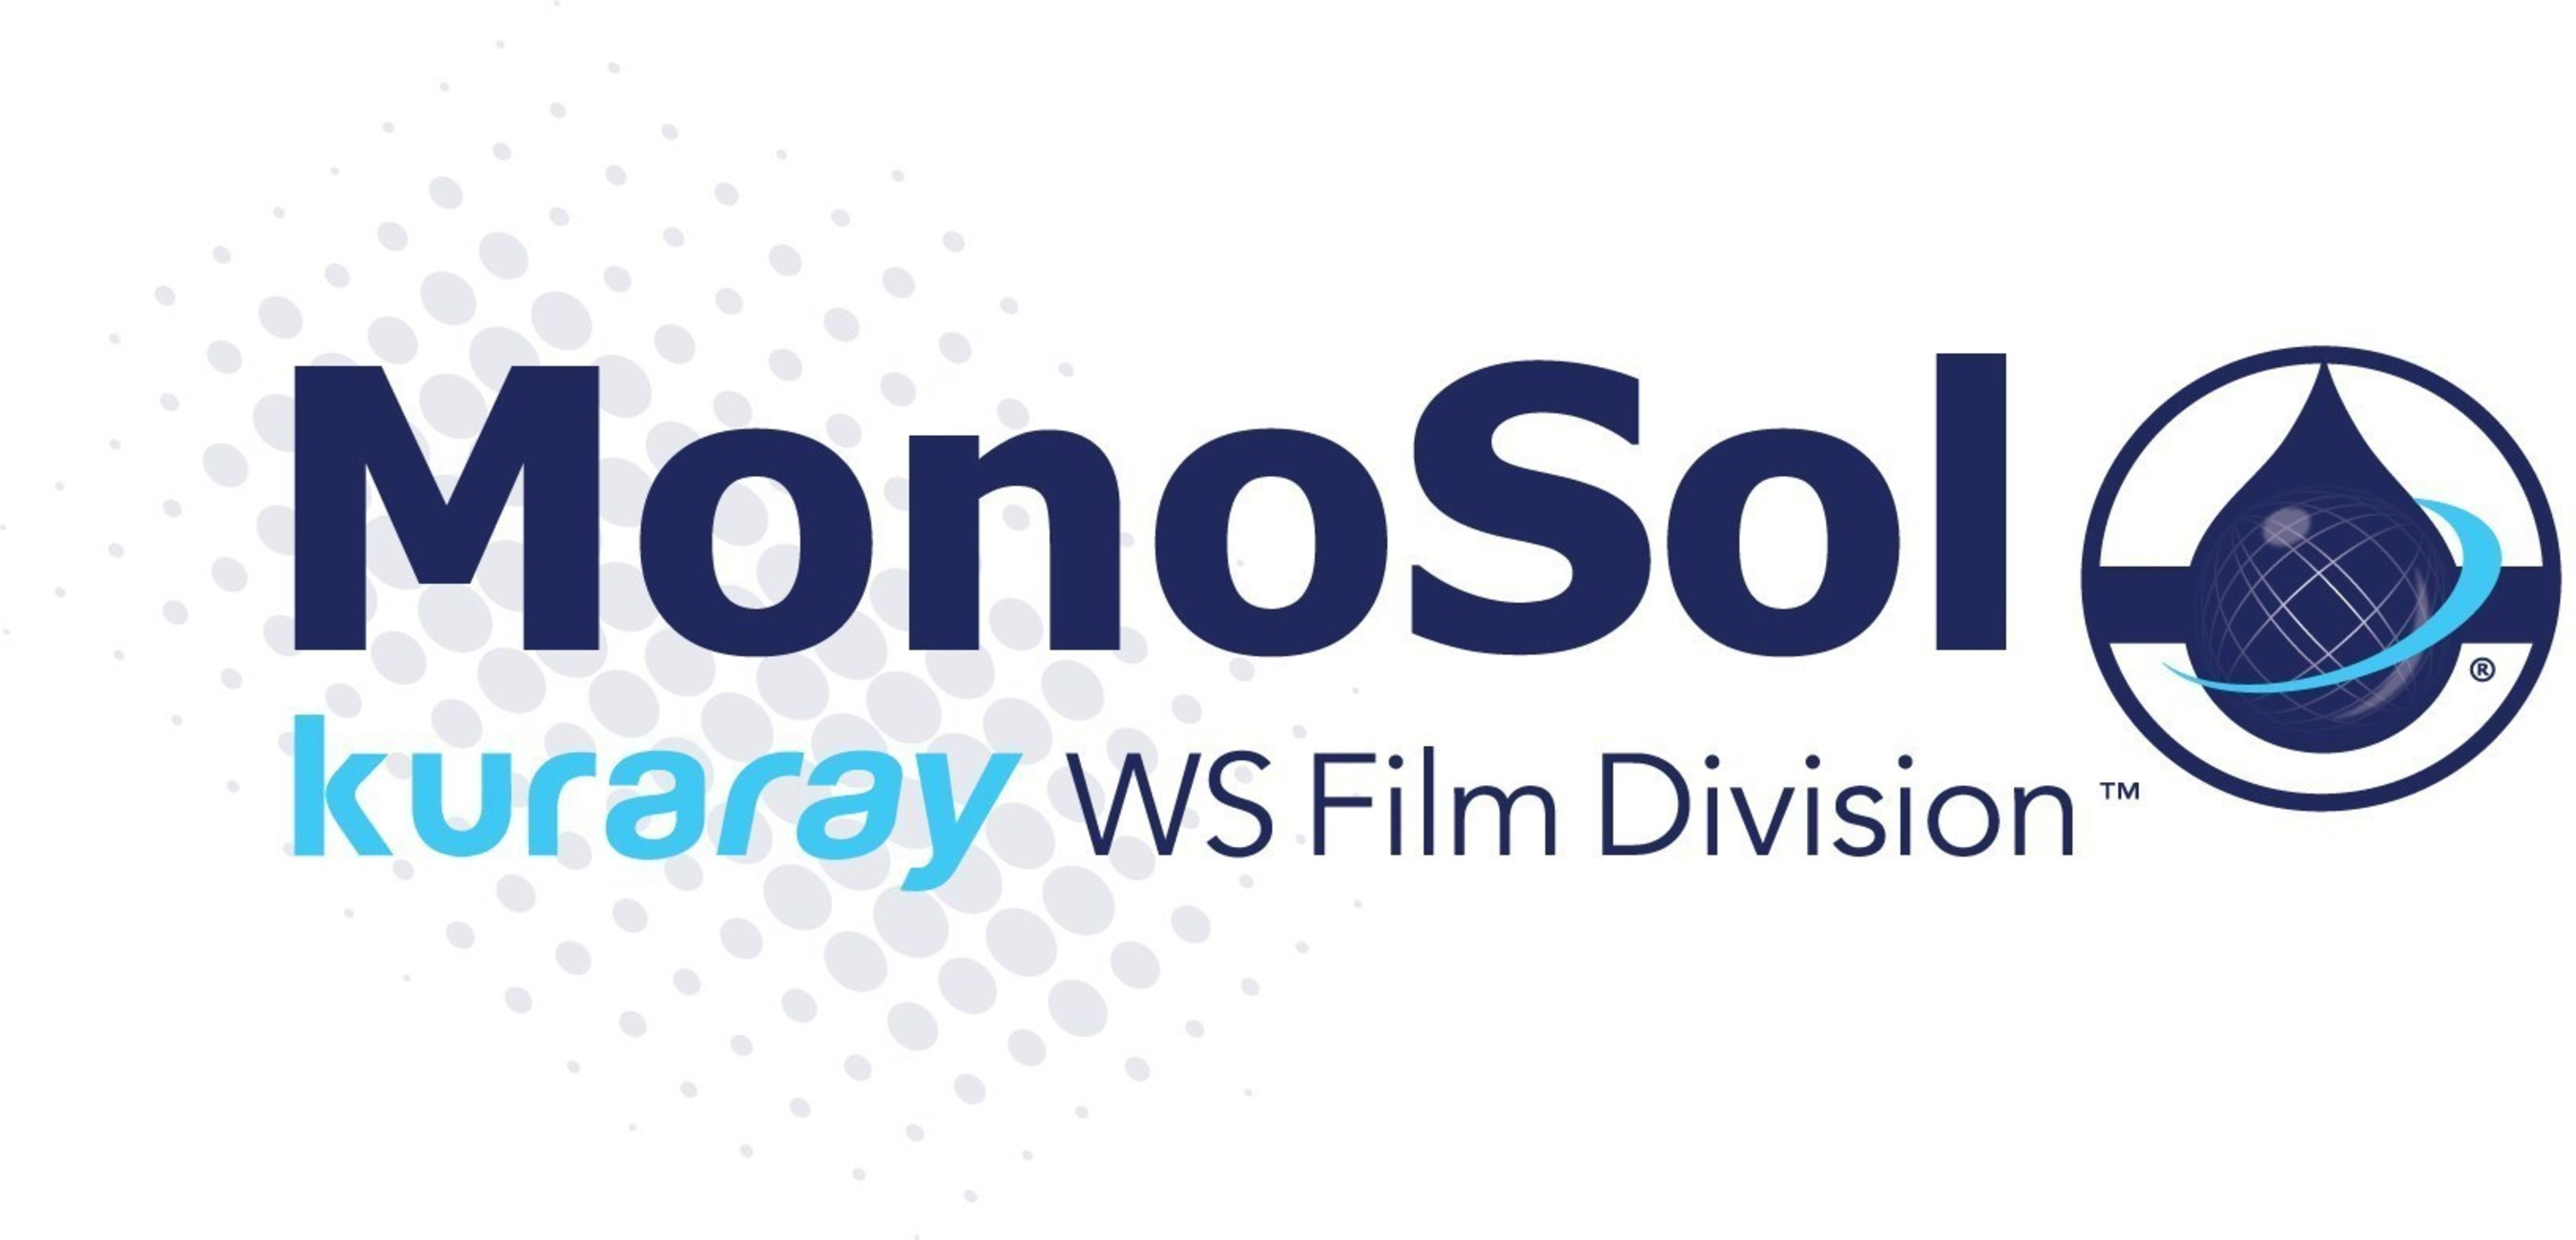 MonoSol, Kuraray's Water-Soluble Film Division